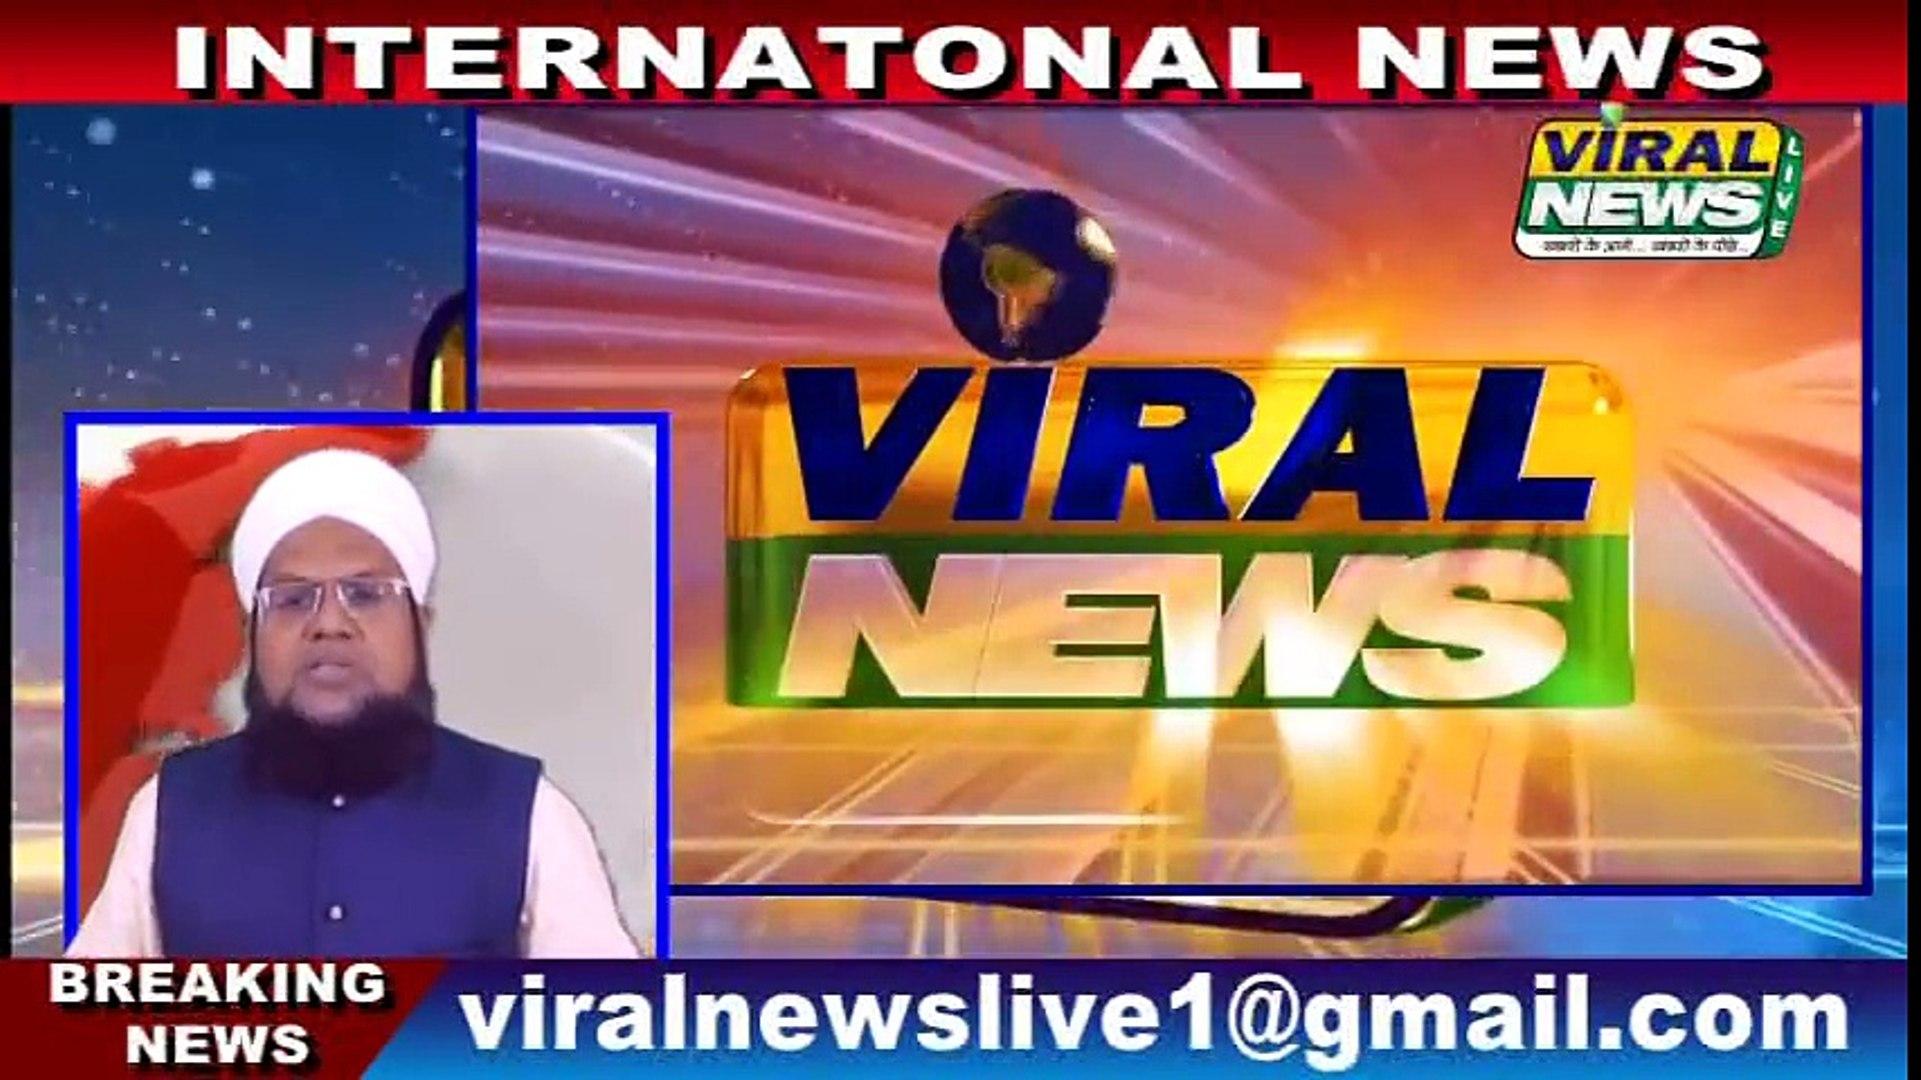 Viral News Live- Most Latest International News